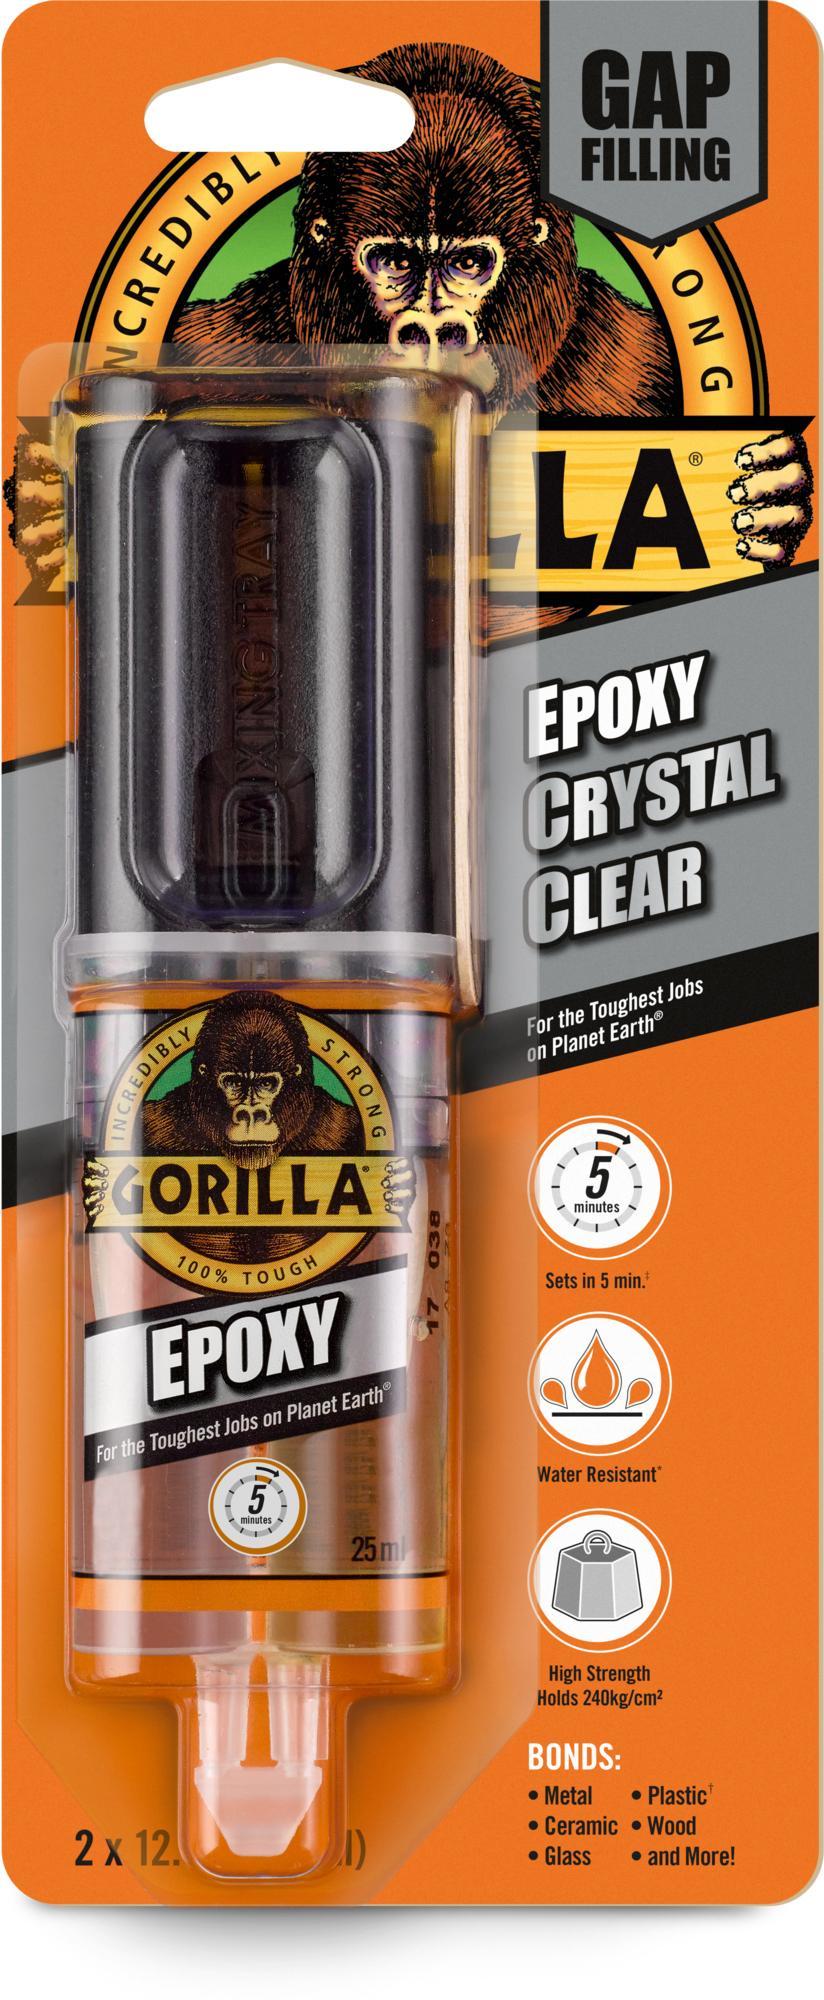 Gorilla Epoxy 25Ml lowest price